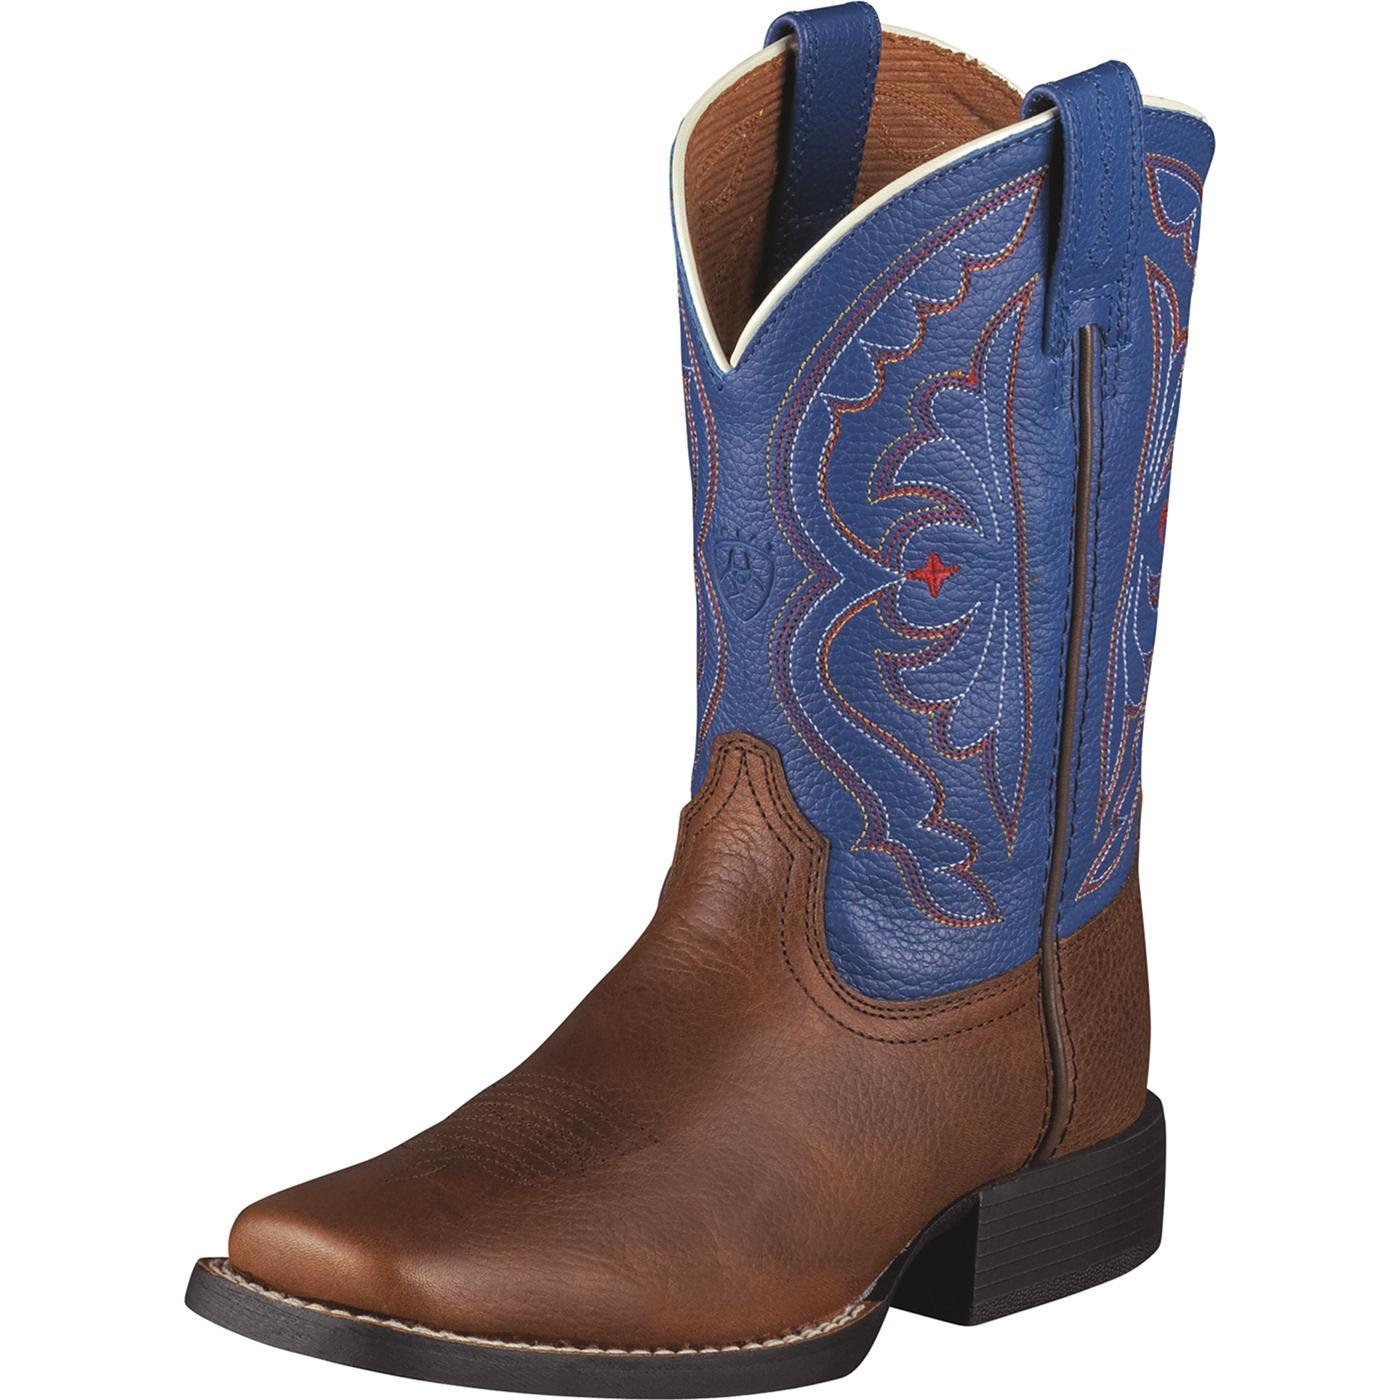 9163233d8f7 Ariat Quickdraw Kids' Western Boot